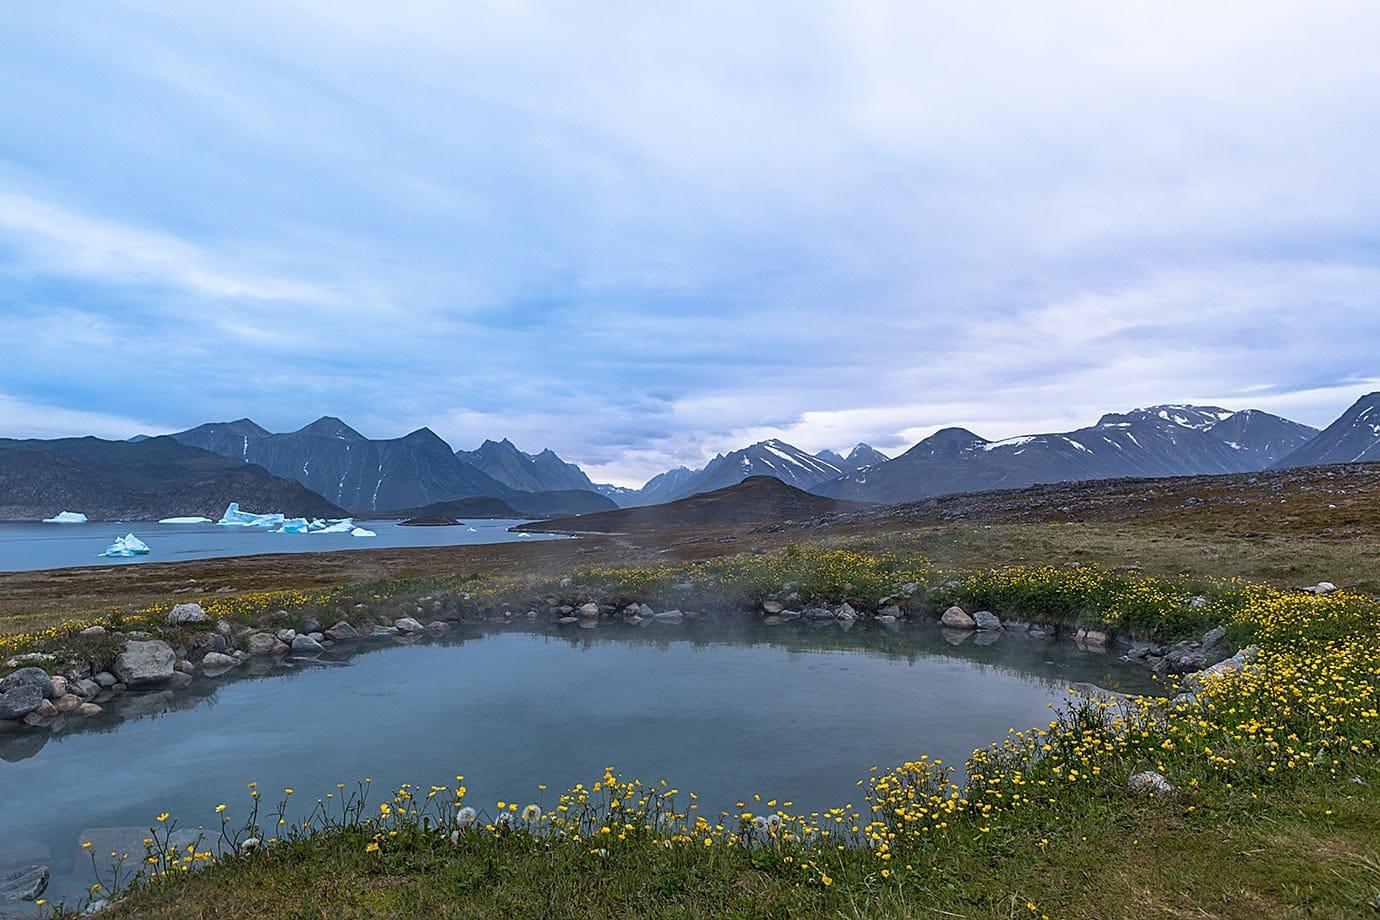 Uunartoq Hot Springs near Qaqortoq in Southern Greenland